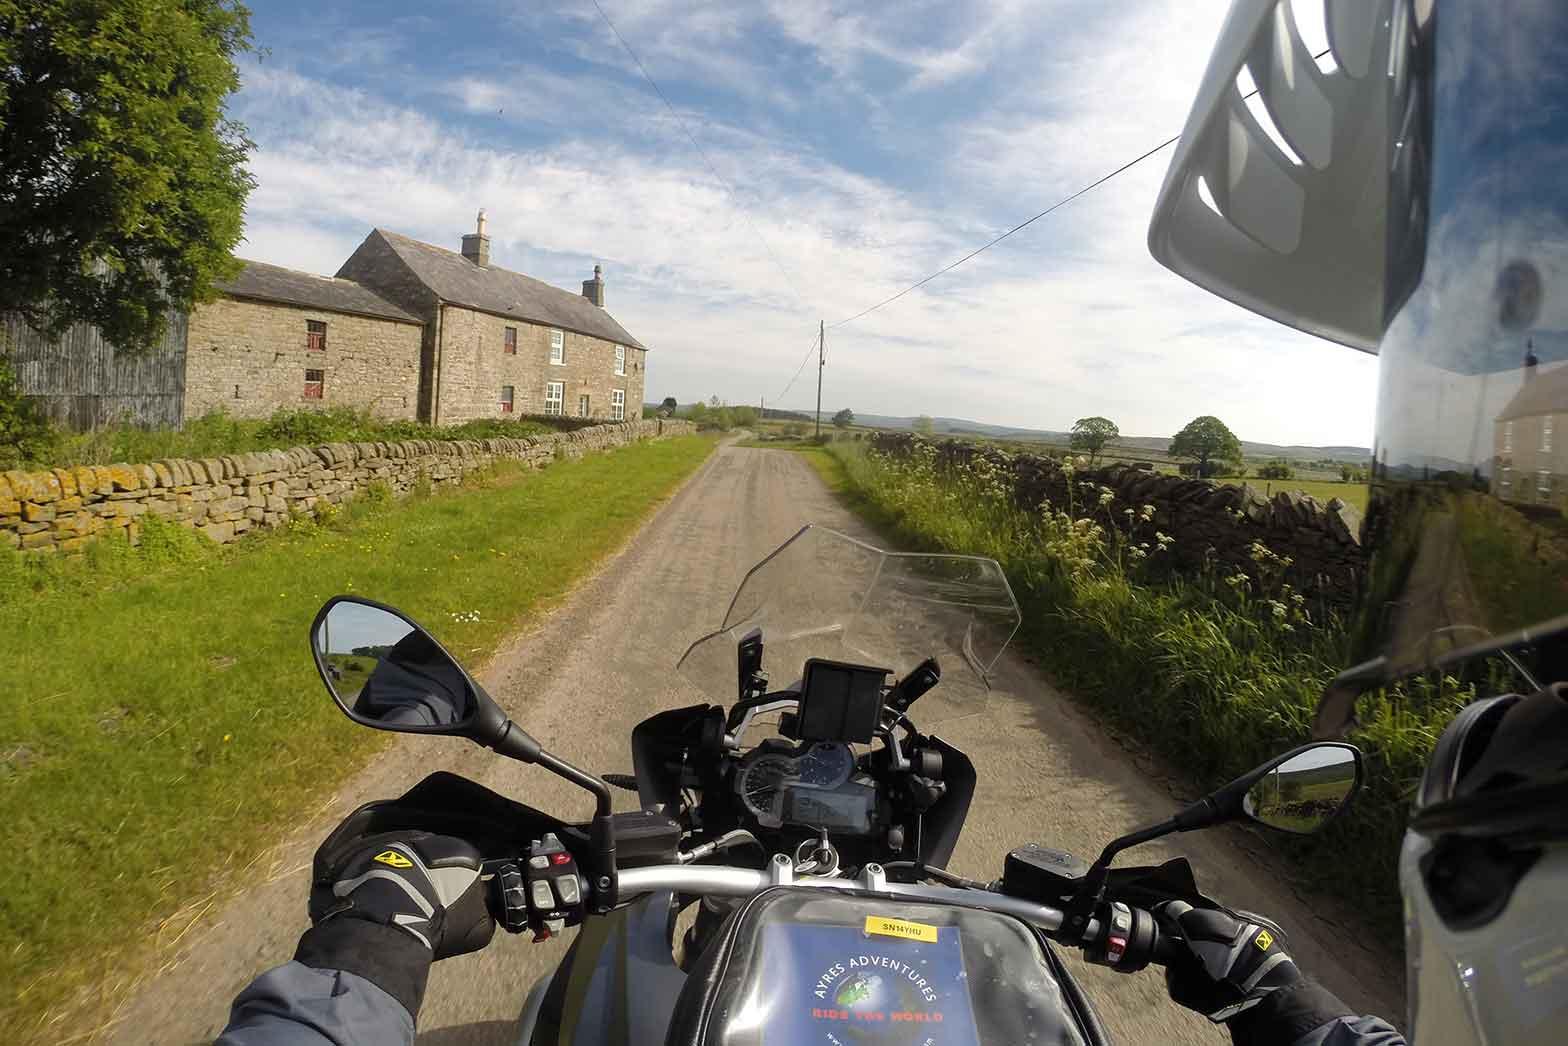 Passing through the farmlands